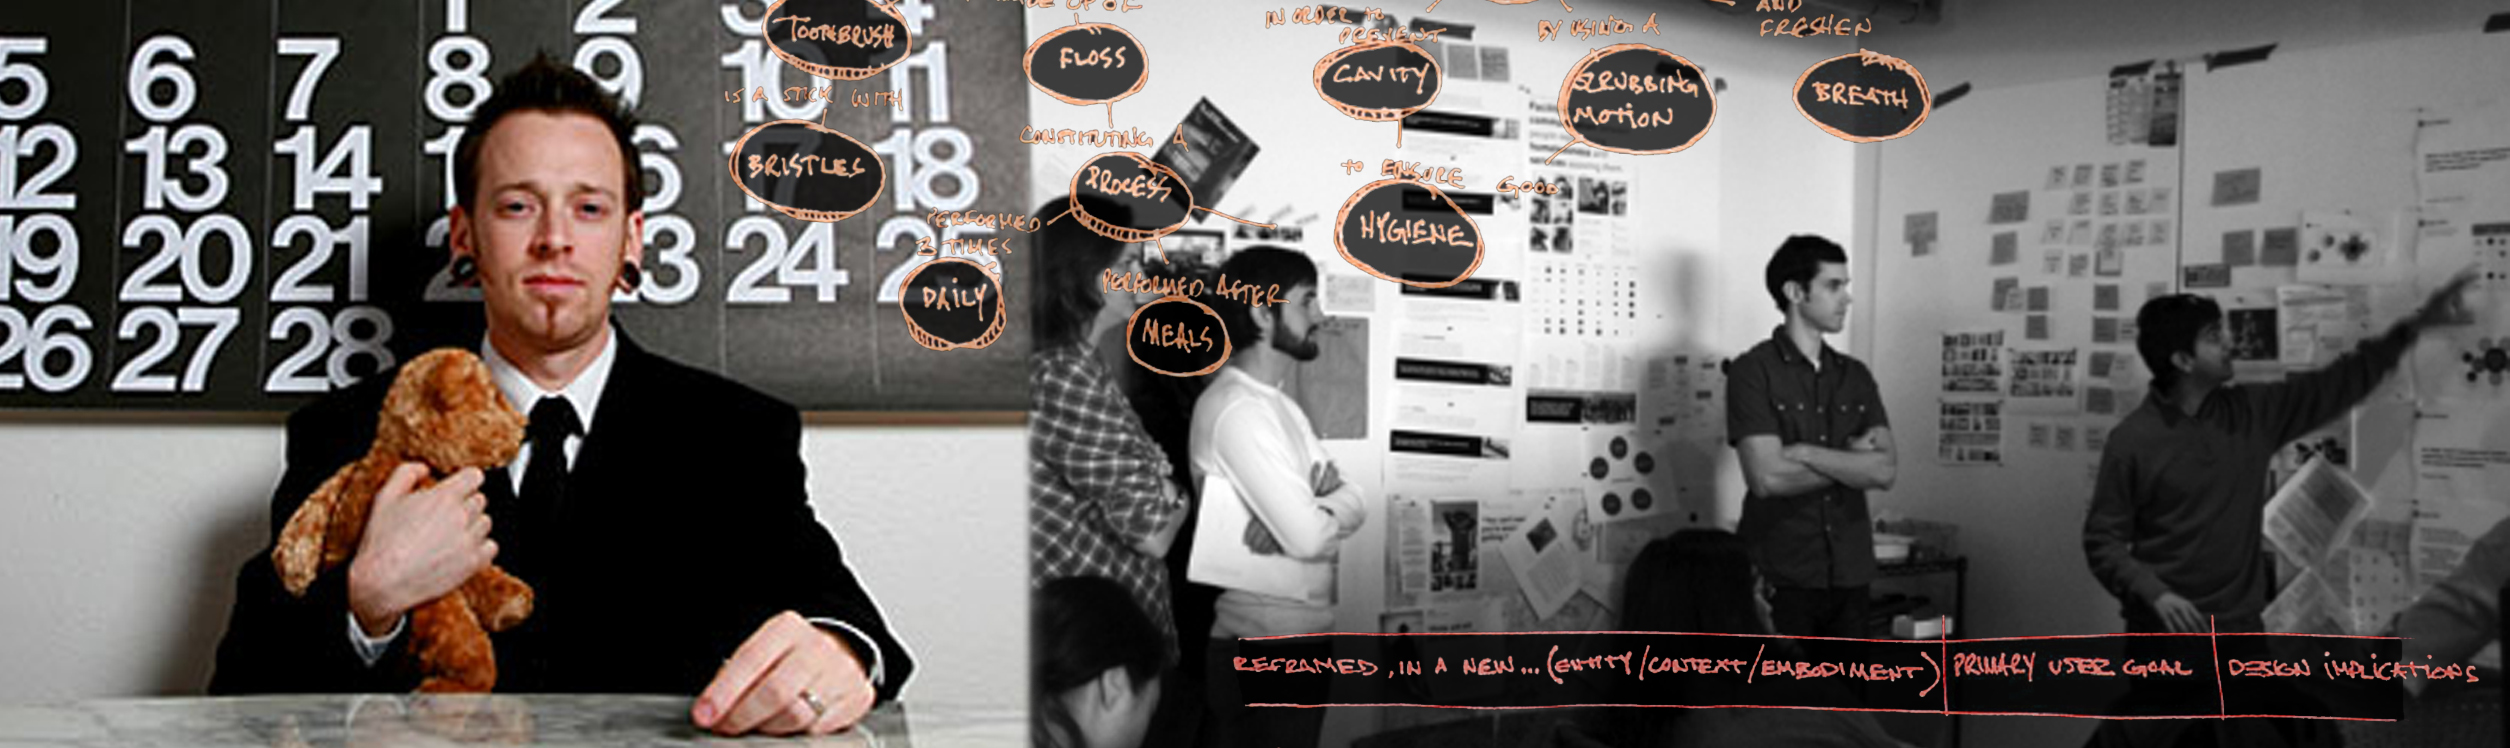 Exposing The Magic of Design with Jon Kolko